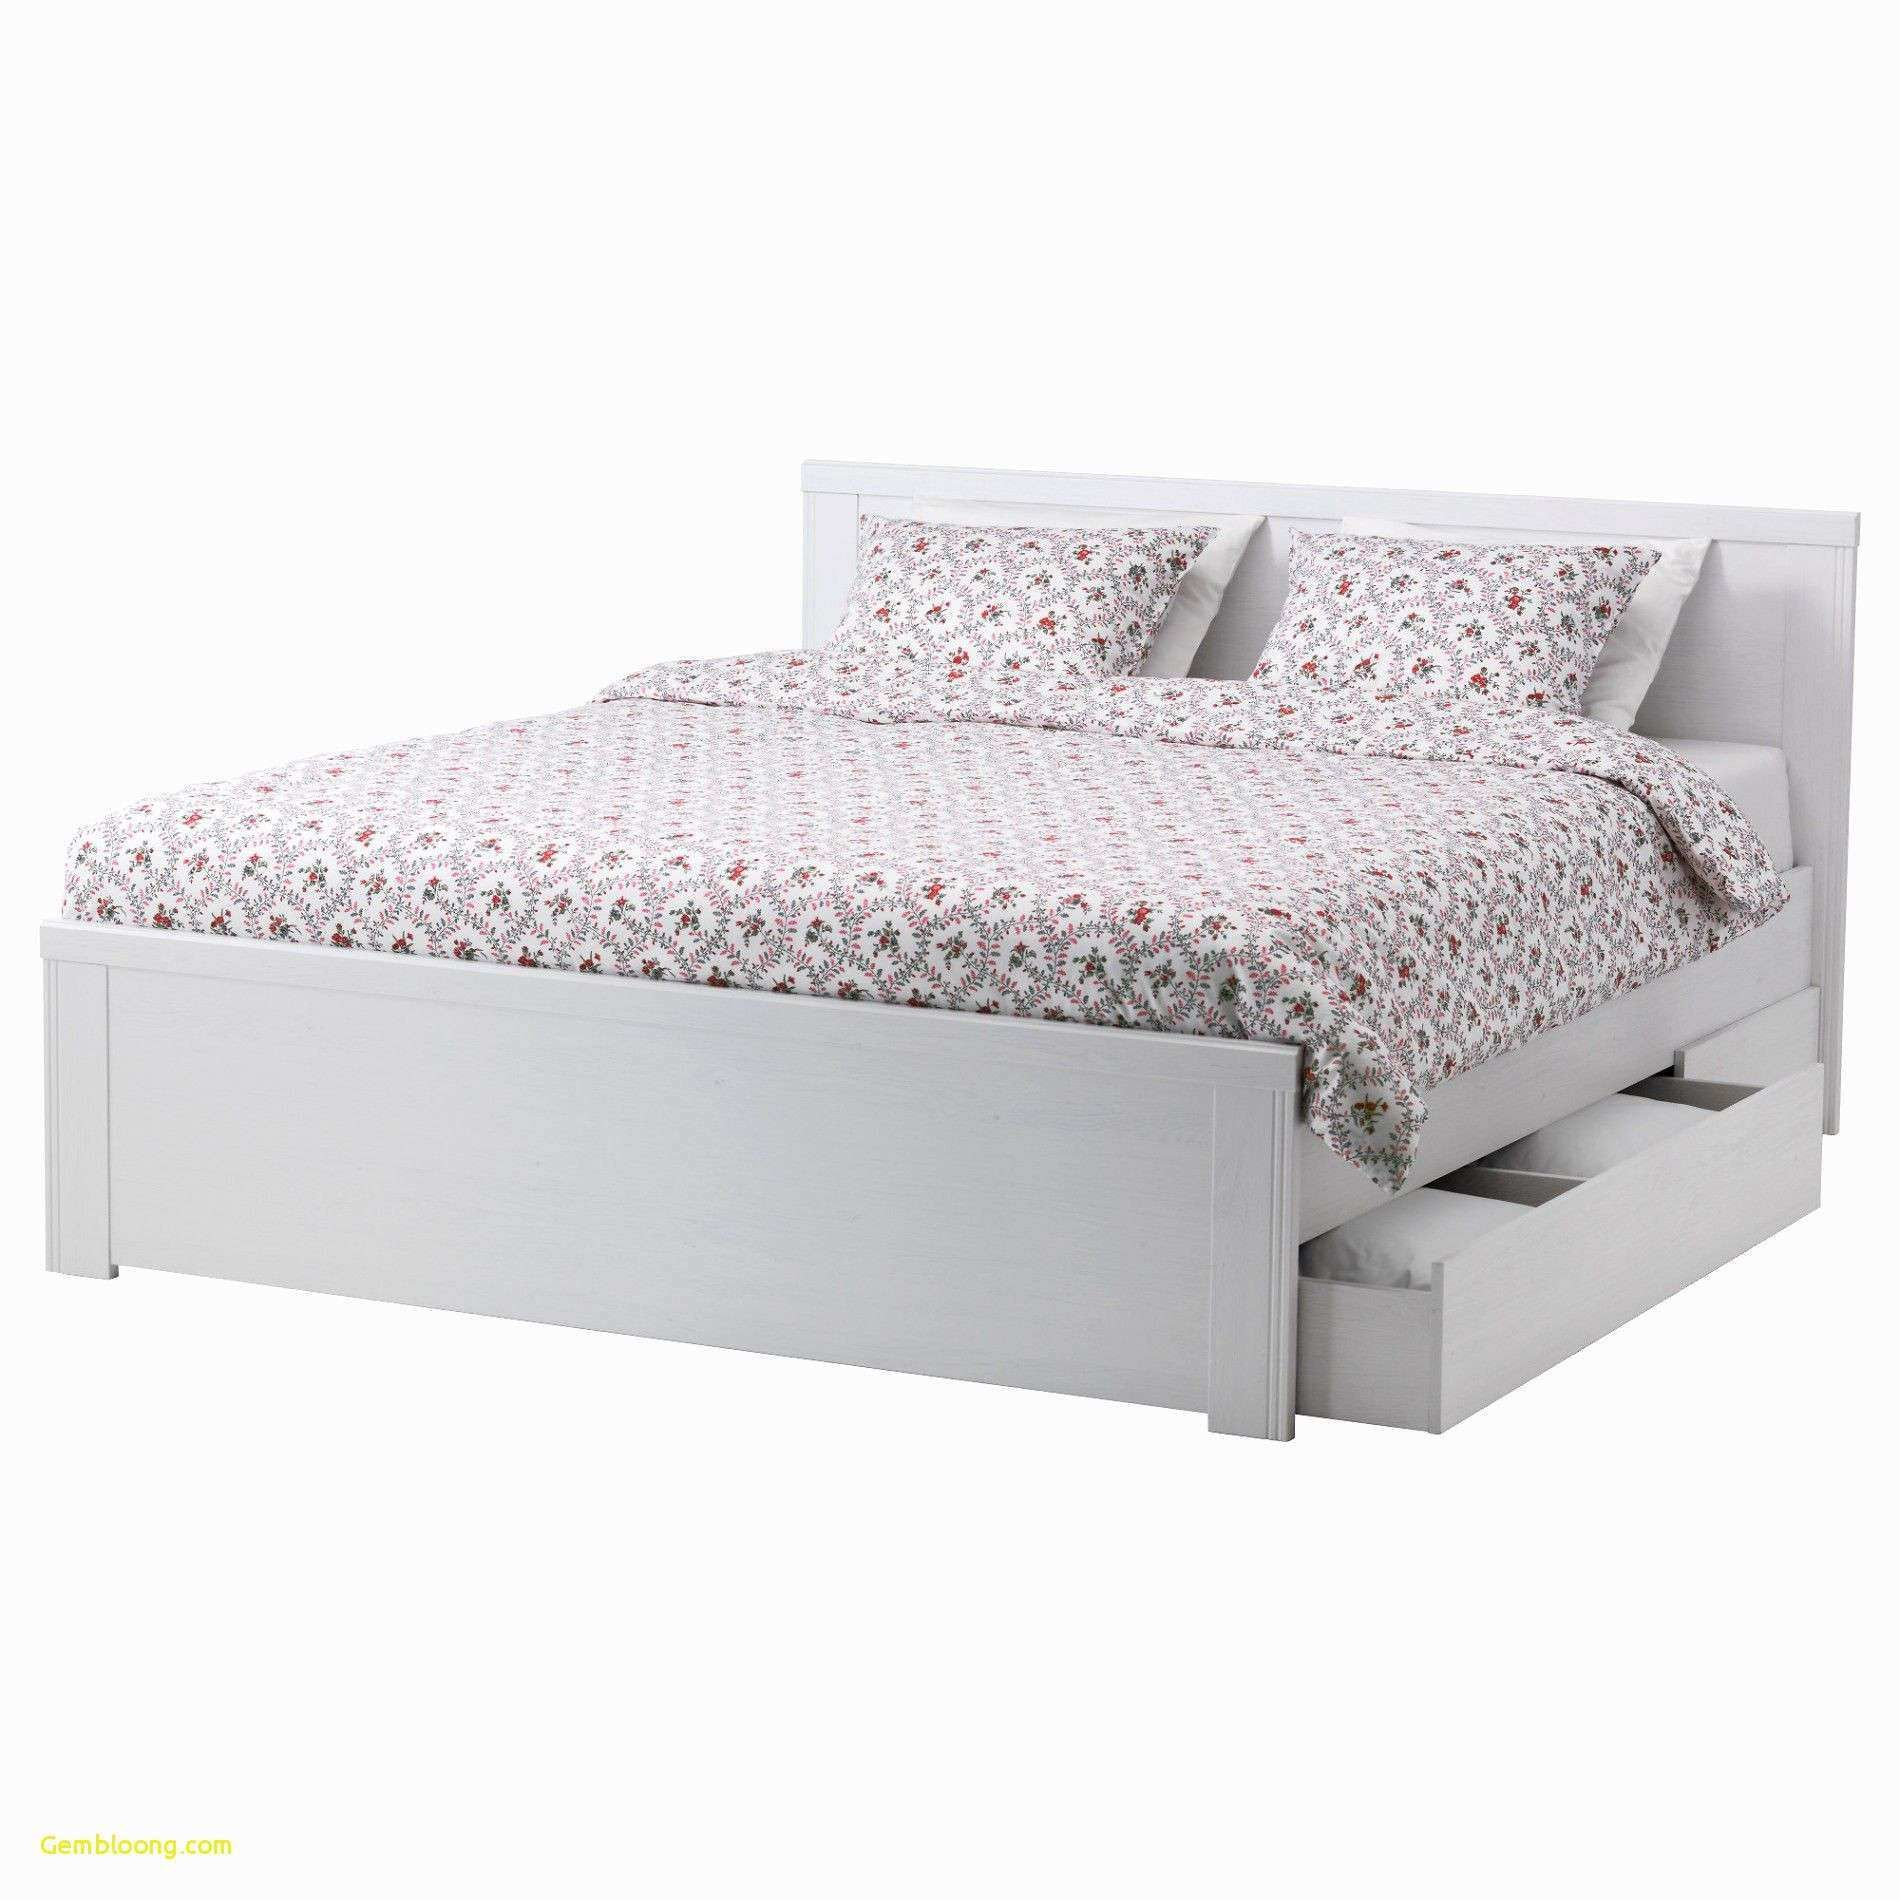 Gray Bedroom Furniture Ikea Tempat Tidur Laci Bingkai Tempat Tidur Tempat Tidur Dengan Penyimpanan